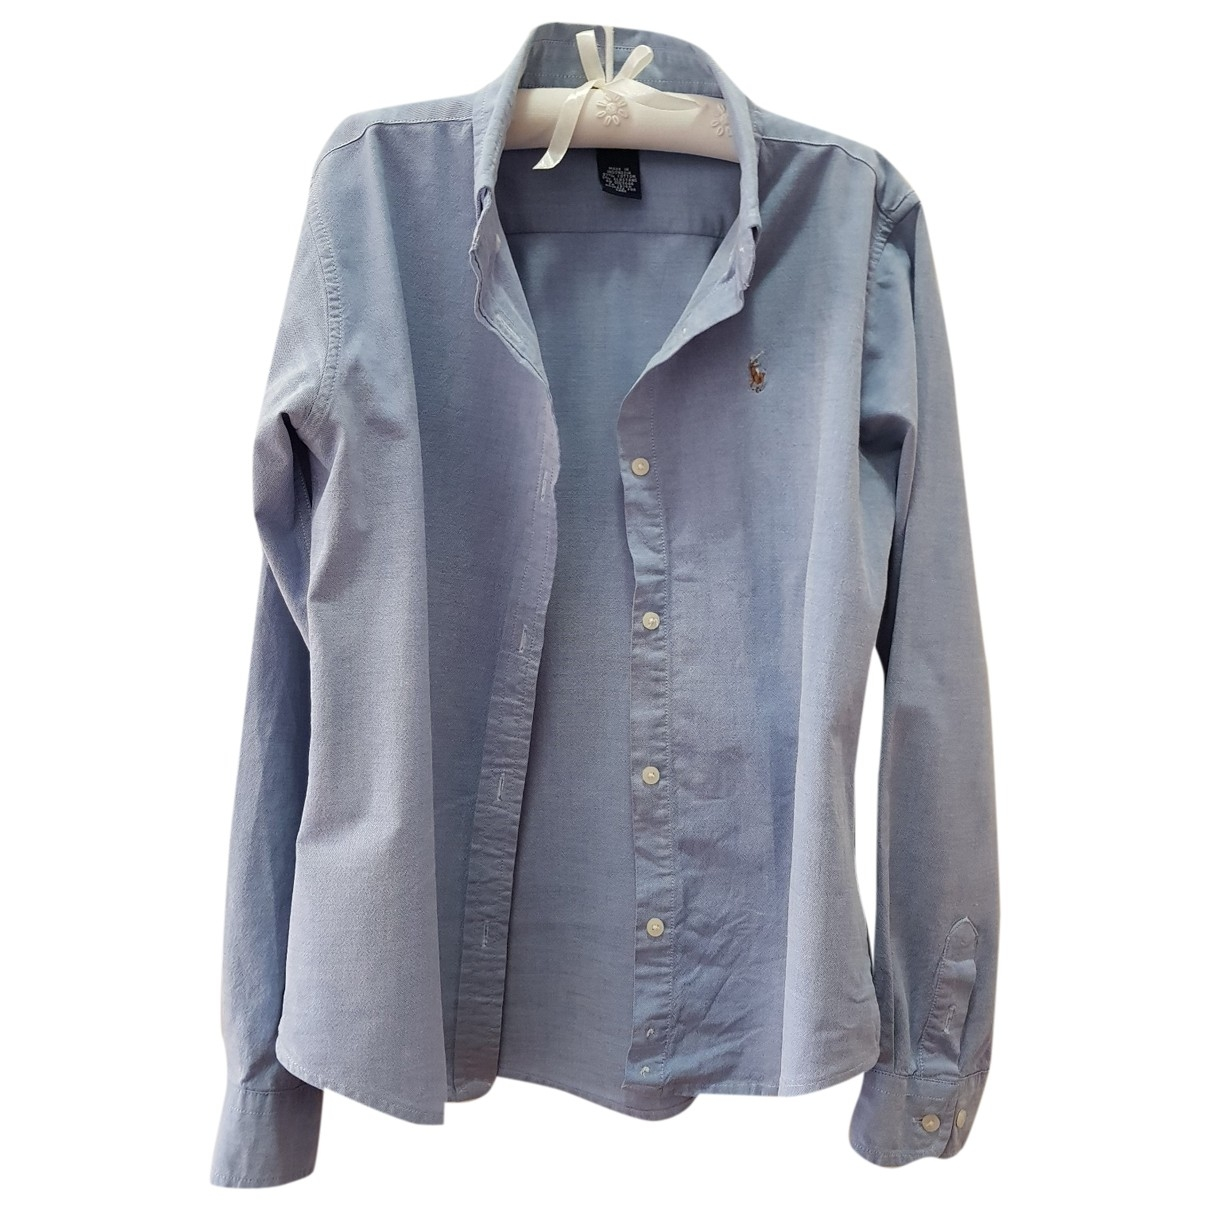 Polo Ralph Lauren \N Blue Cotton  top for Kids 20 years - XL FR